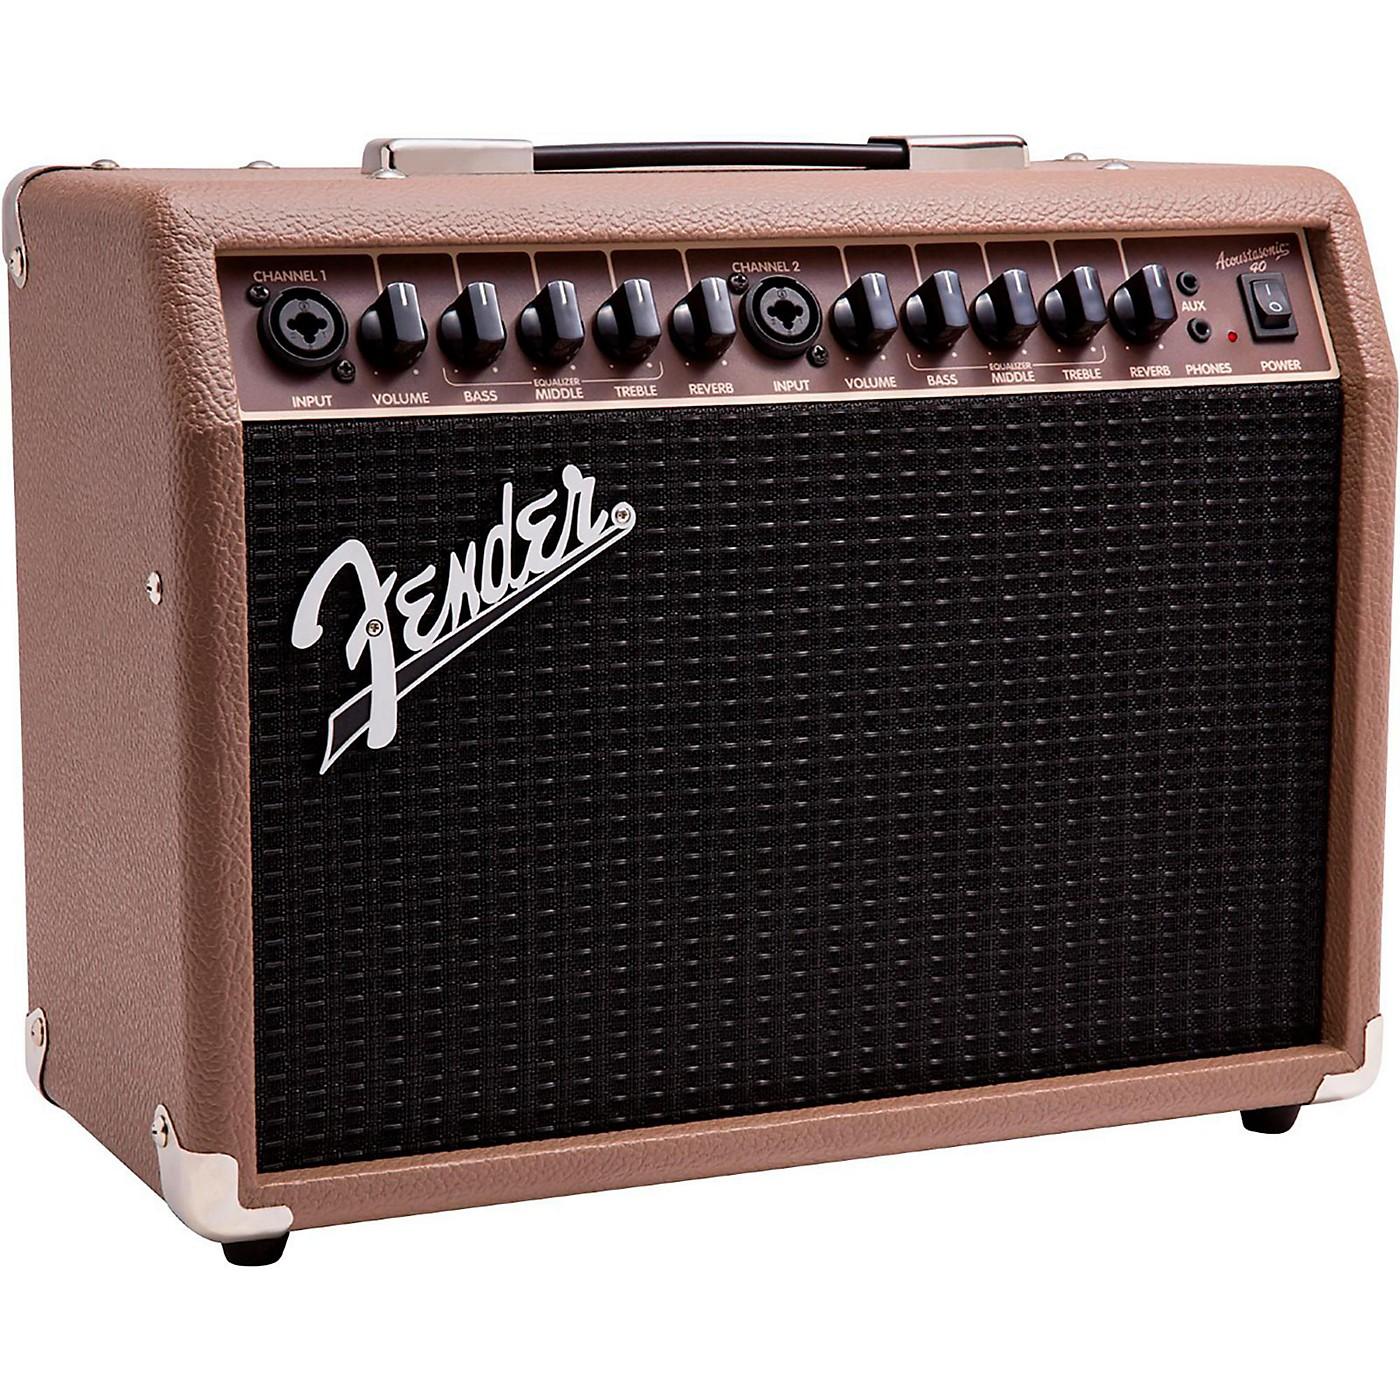 Fender Acoustasonic 40 40W 2x6.5 Acoustic Guitar Amplifier thumbnail